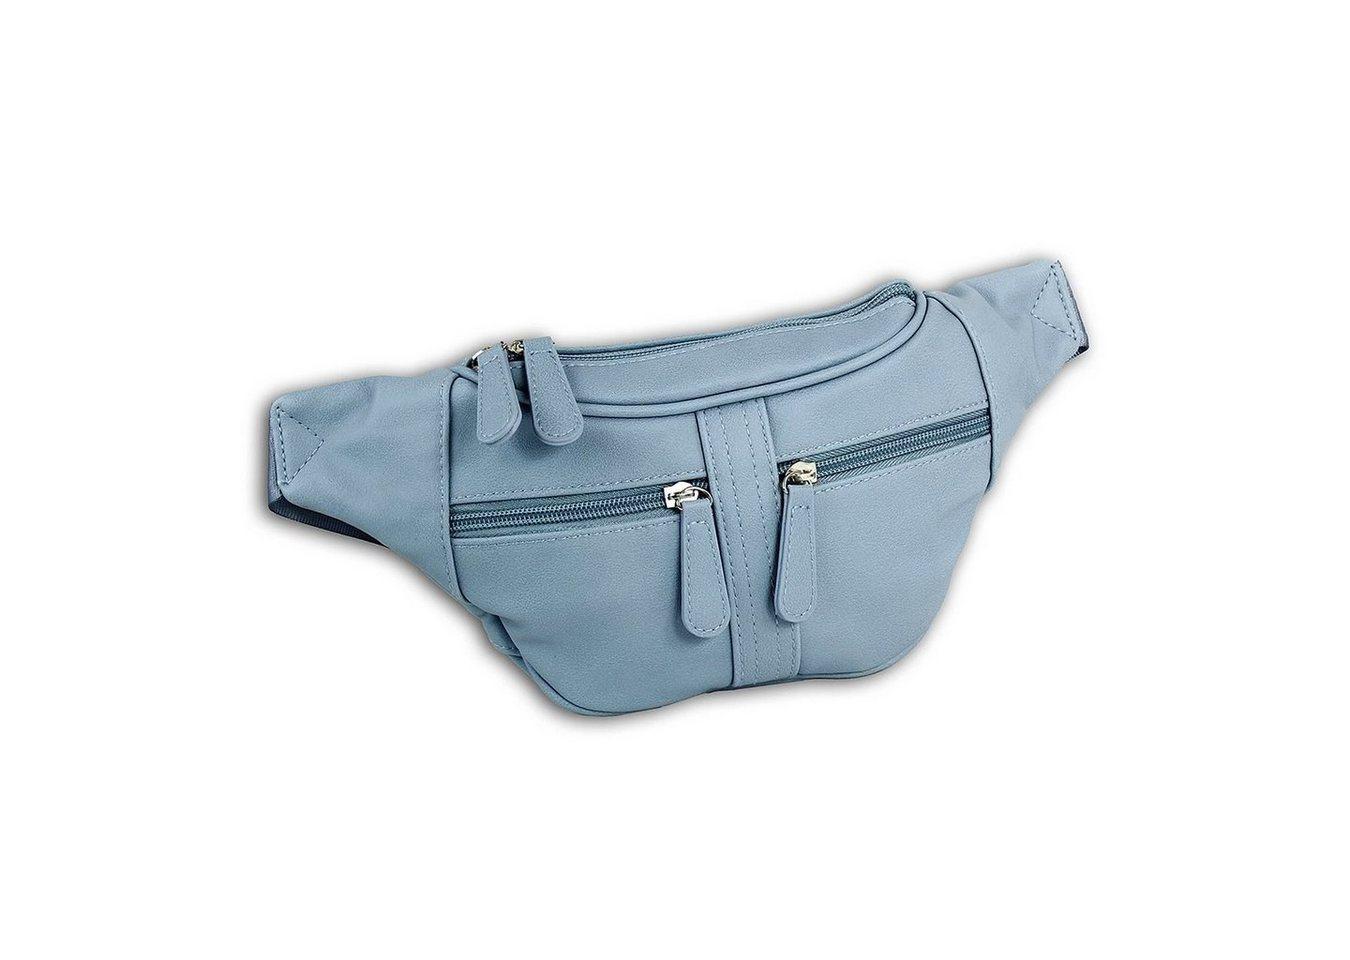 new bags -  Gürteltasche »OTD5023X  Damen Hüfttasche Gürteltasche« (Gürteltasche), Damen, Jugend Tasche softblau, ca. 35cm x ca. 5cm